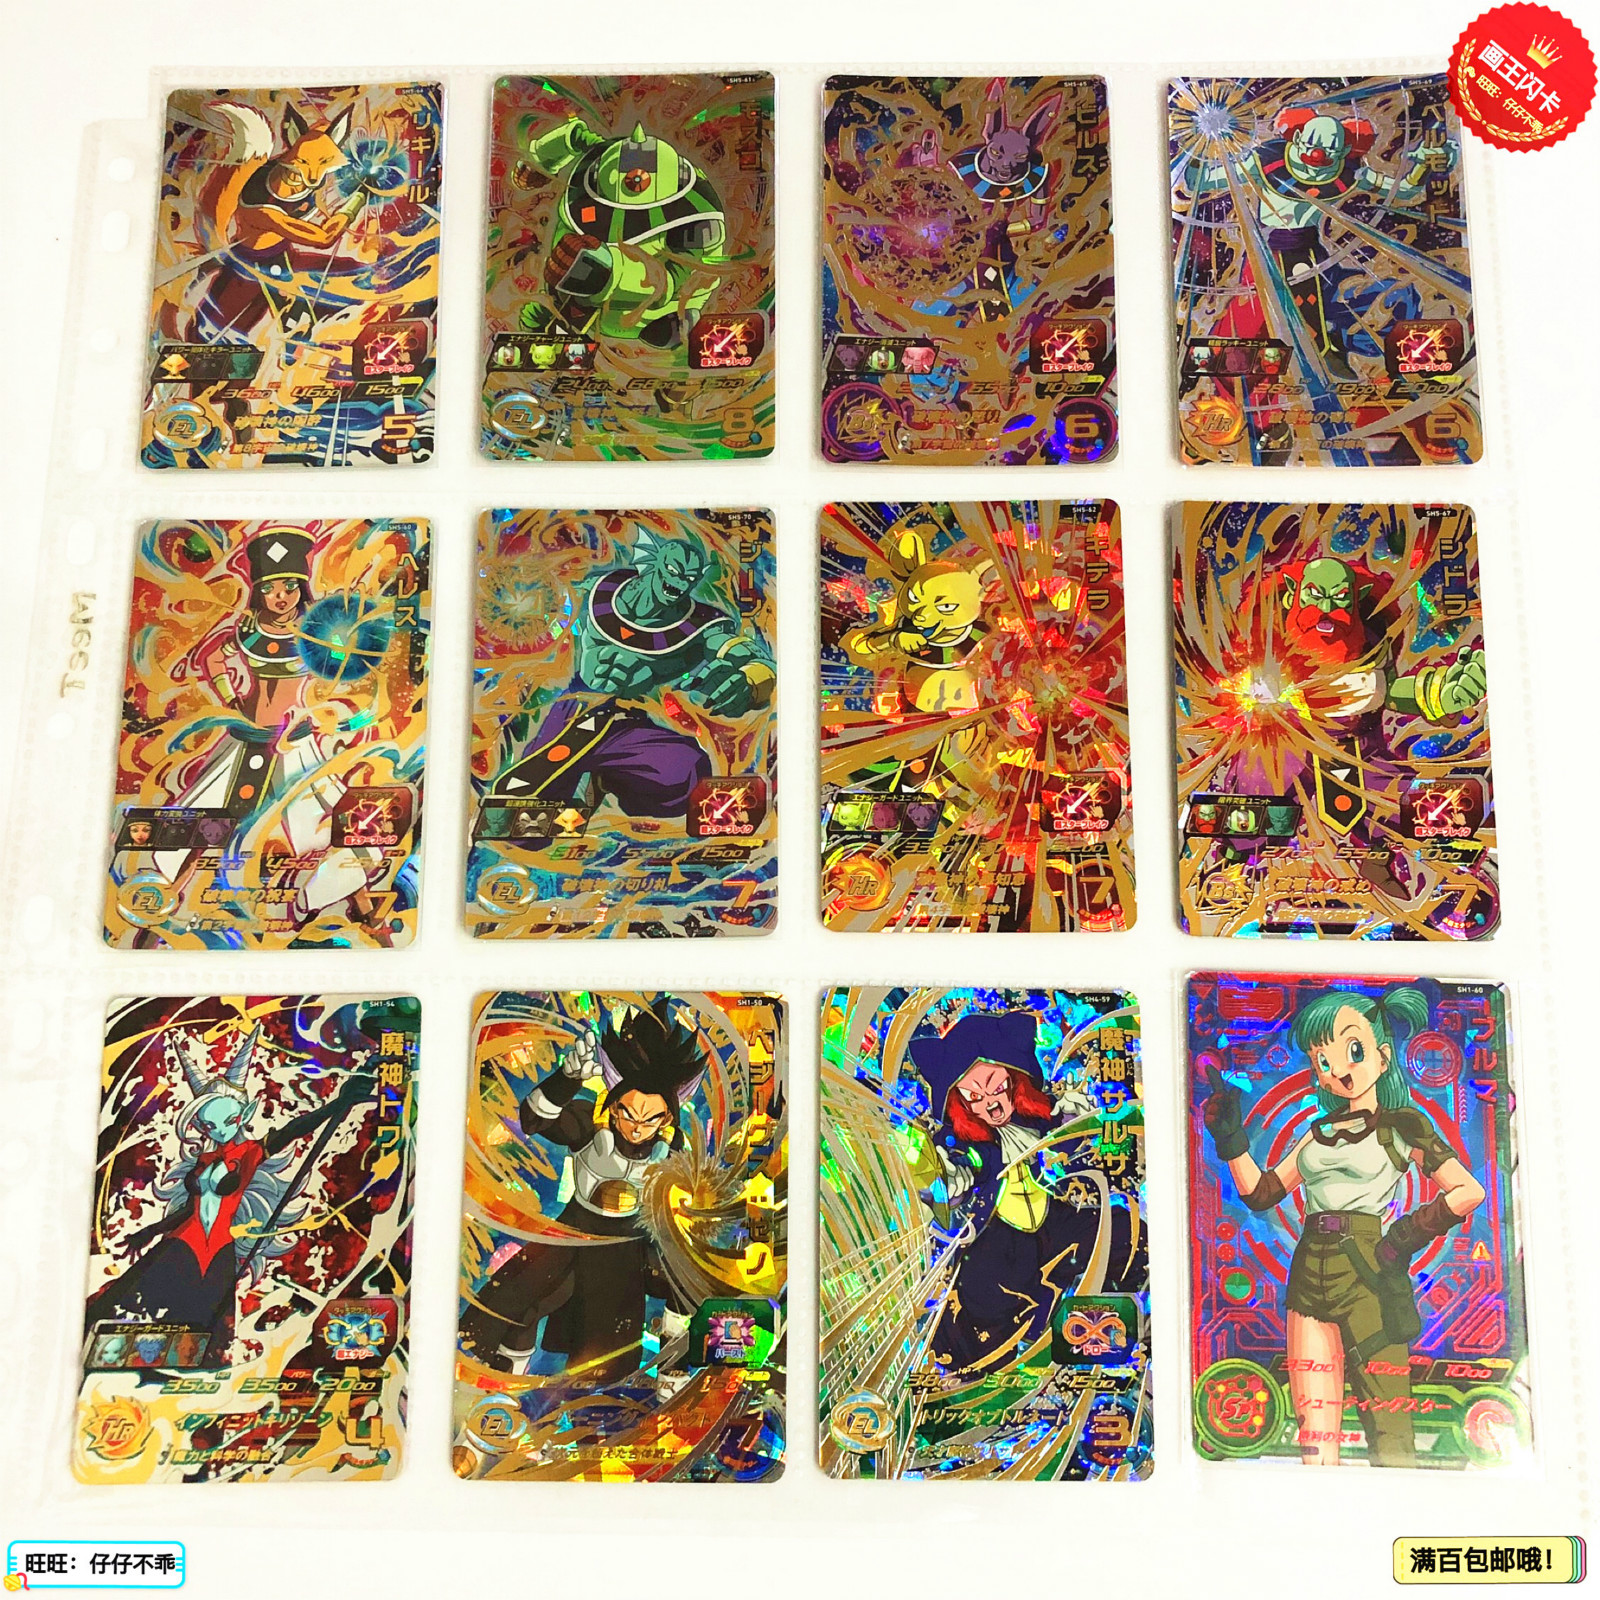 Japan Original Dragon Ball Hero Card 4 Stars UR Goku Toys Hobbies Collectibles Game Collection Anime Cards